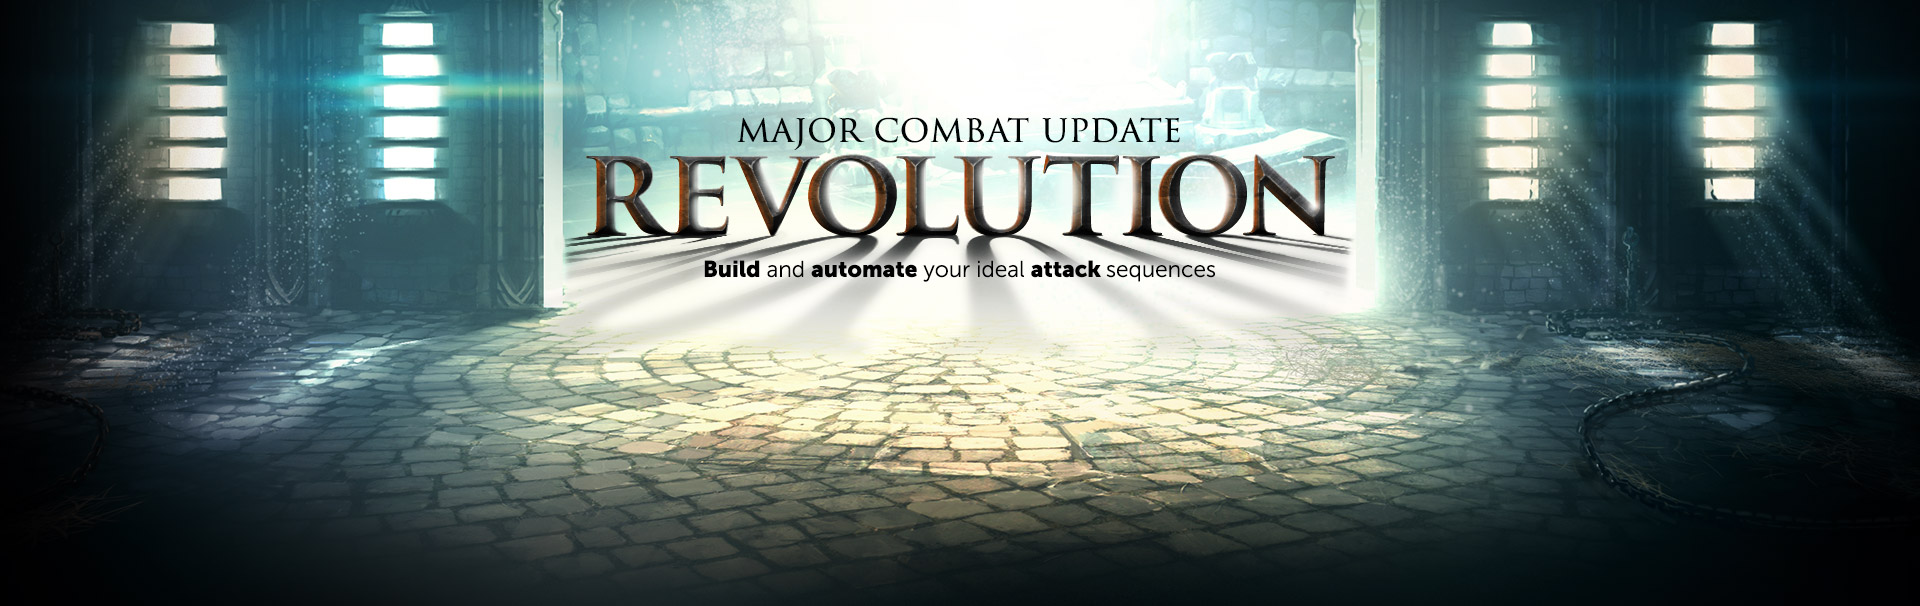 RS3_Rotator_Combat-Revolution.jpg